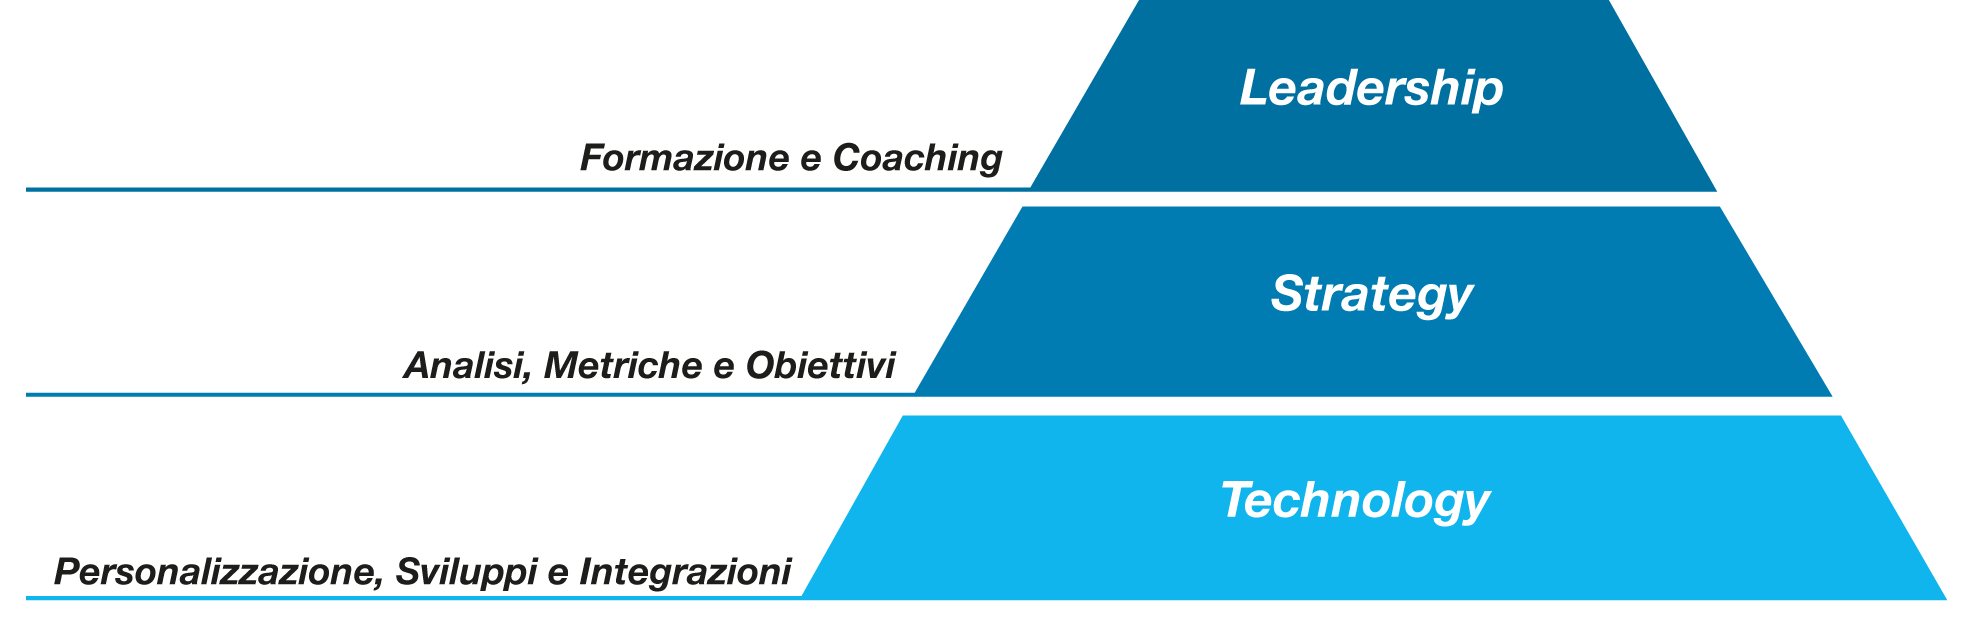 Infografica Leadership.strategy.technology